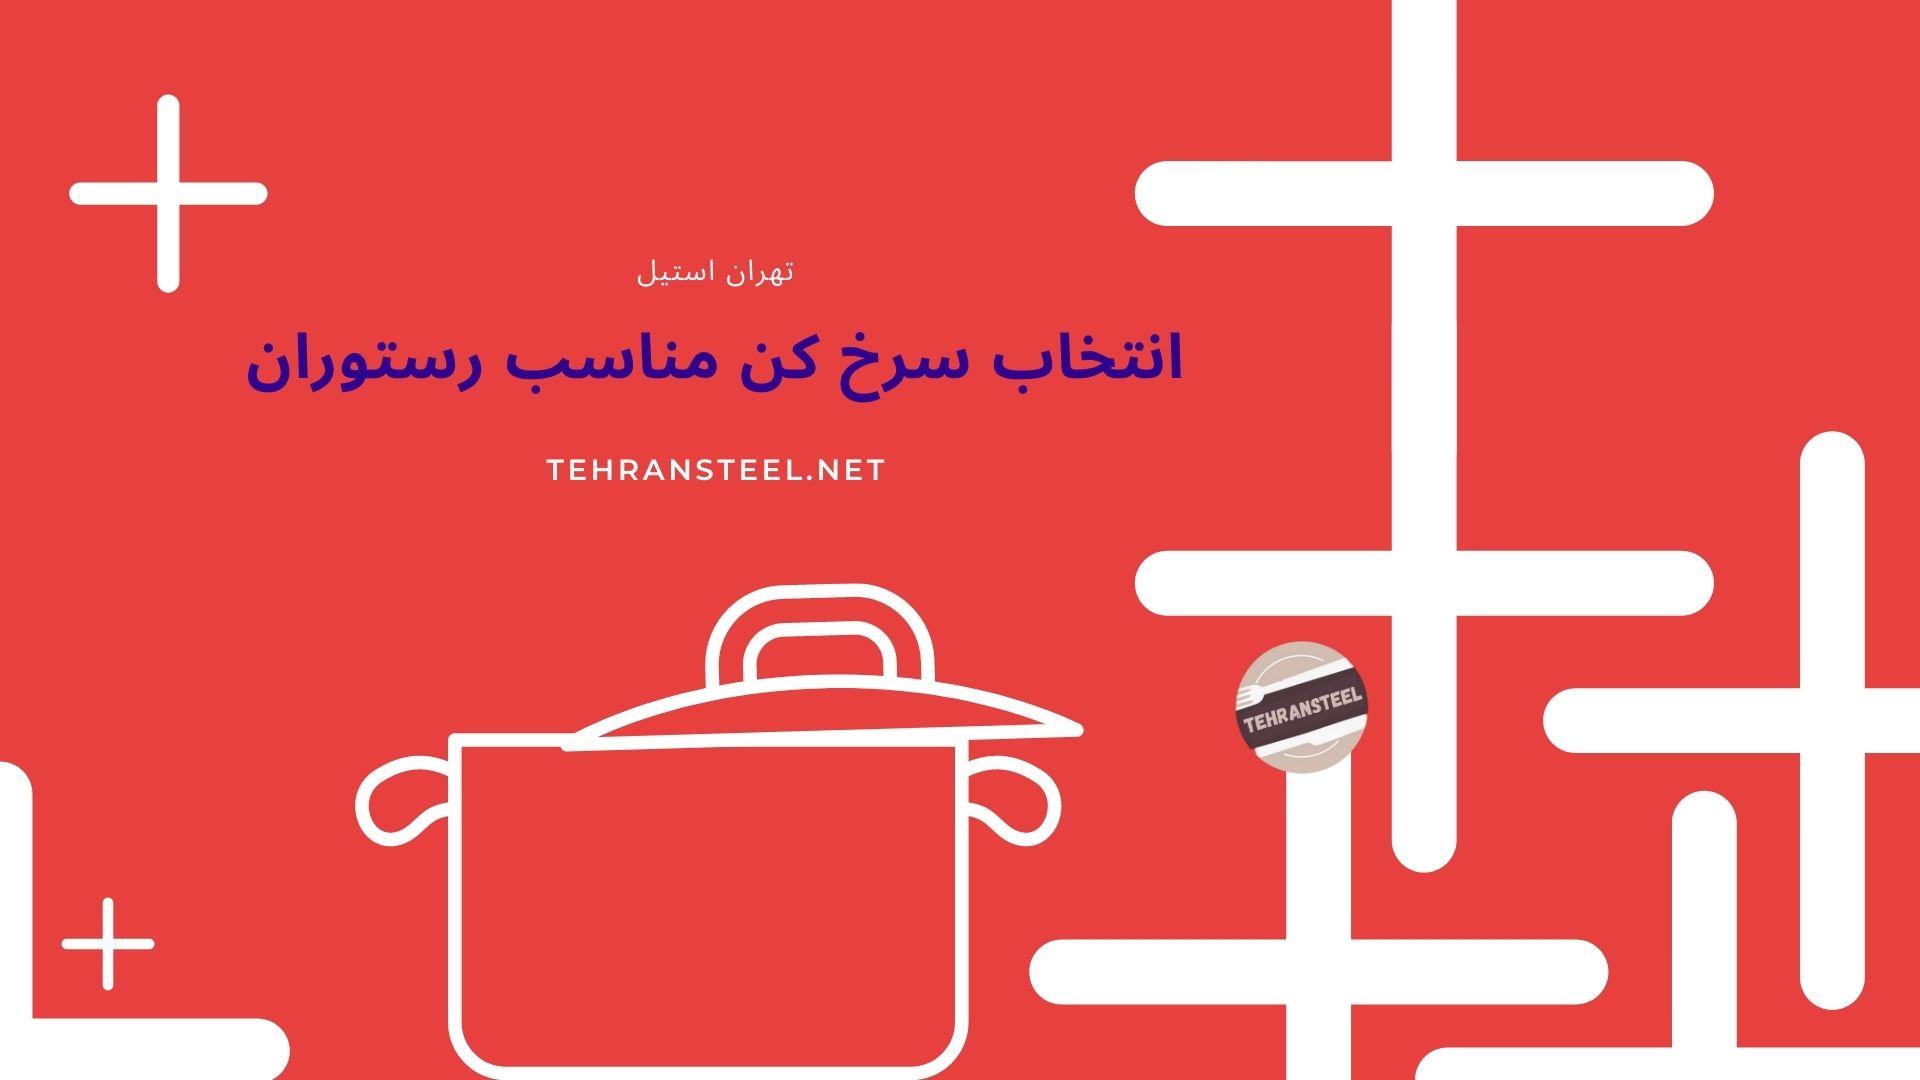 انتخاب سرخ کن مناسب رستوران